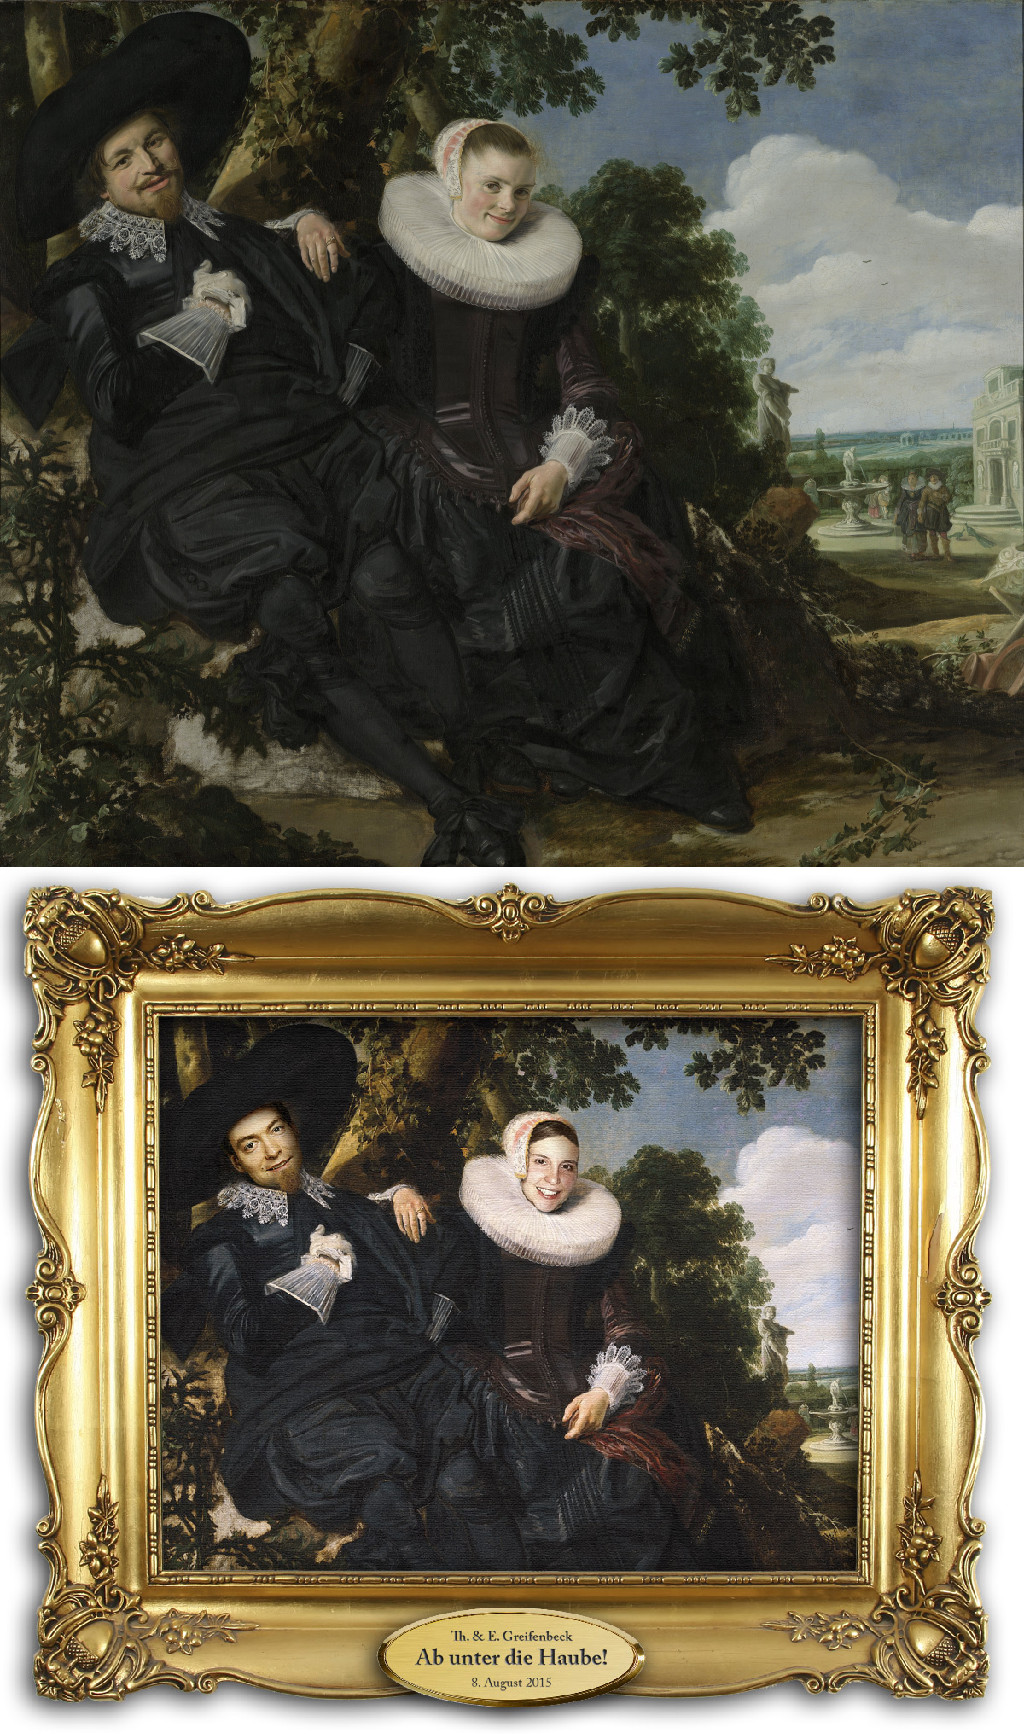 Portrait of a Couple, Probably Isaac Abrahamsz Massa and Beatrix van der Laen, Frans Hals (1580 - 1666) vanGo'd by Thomas